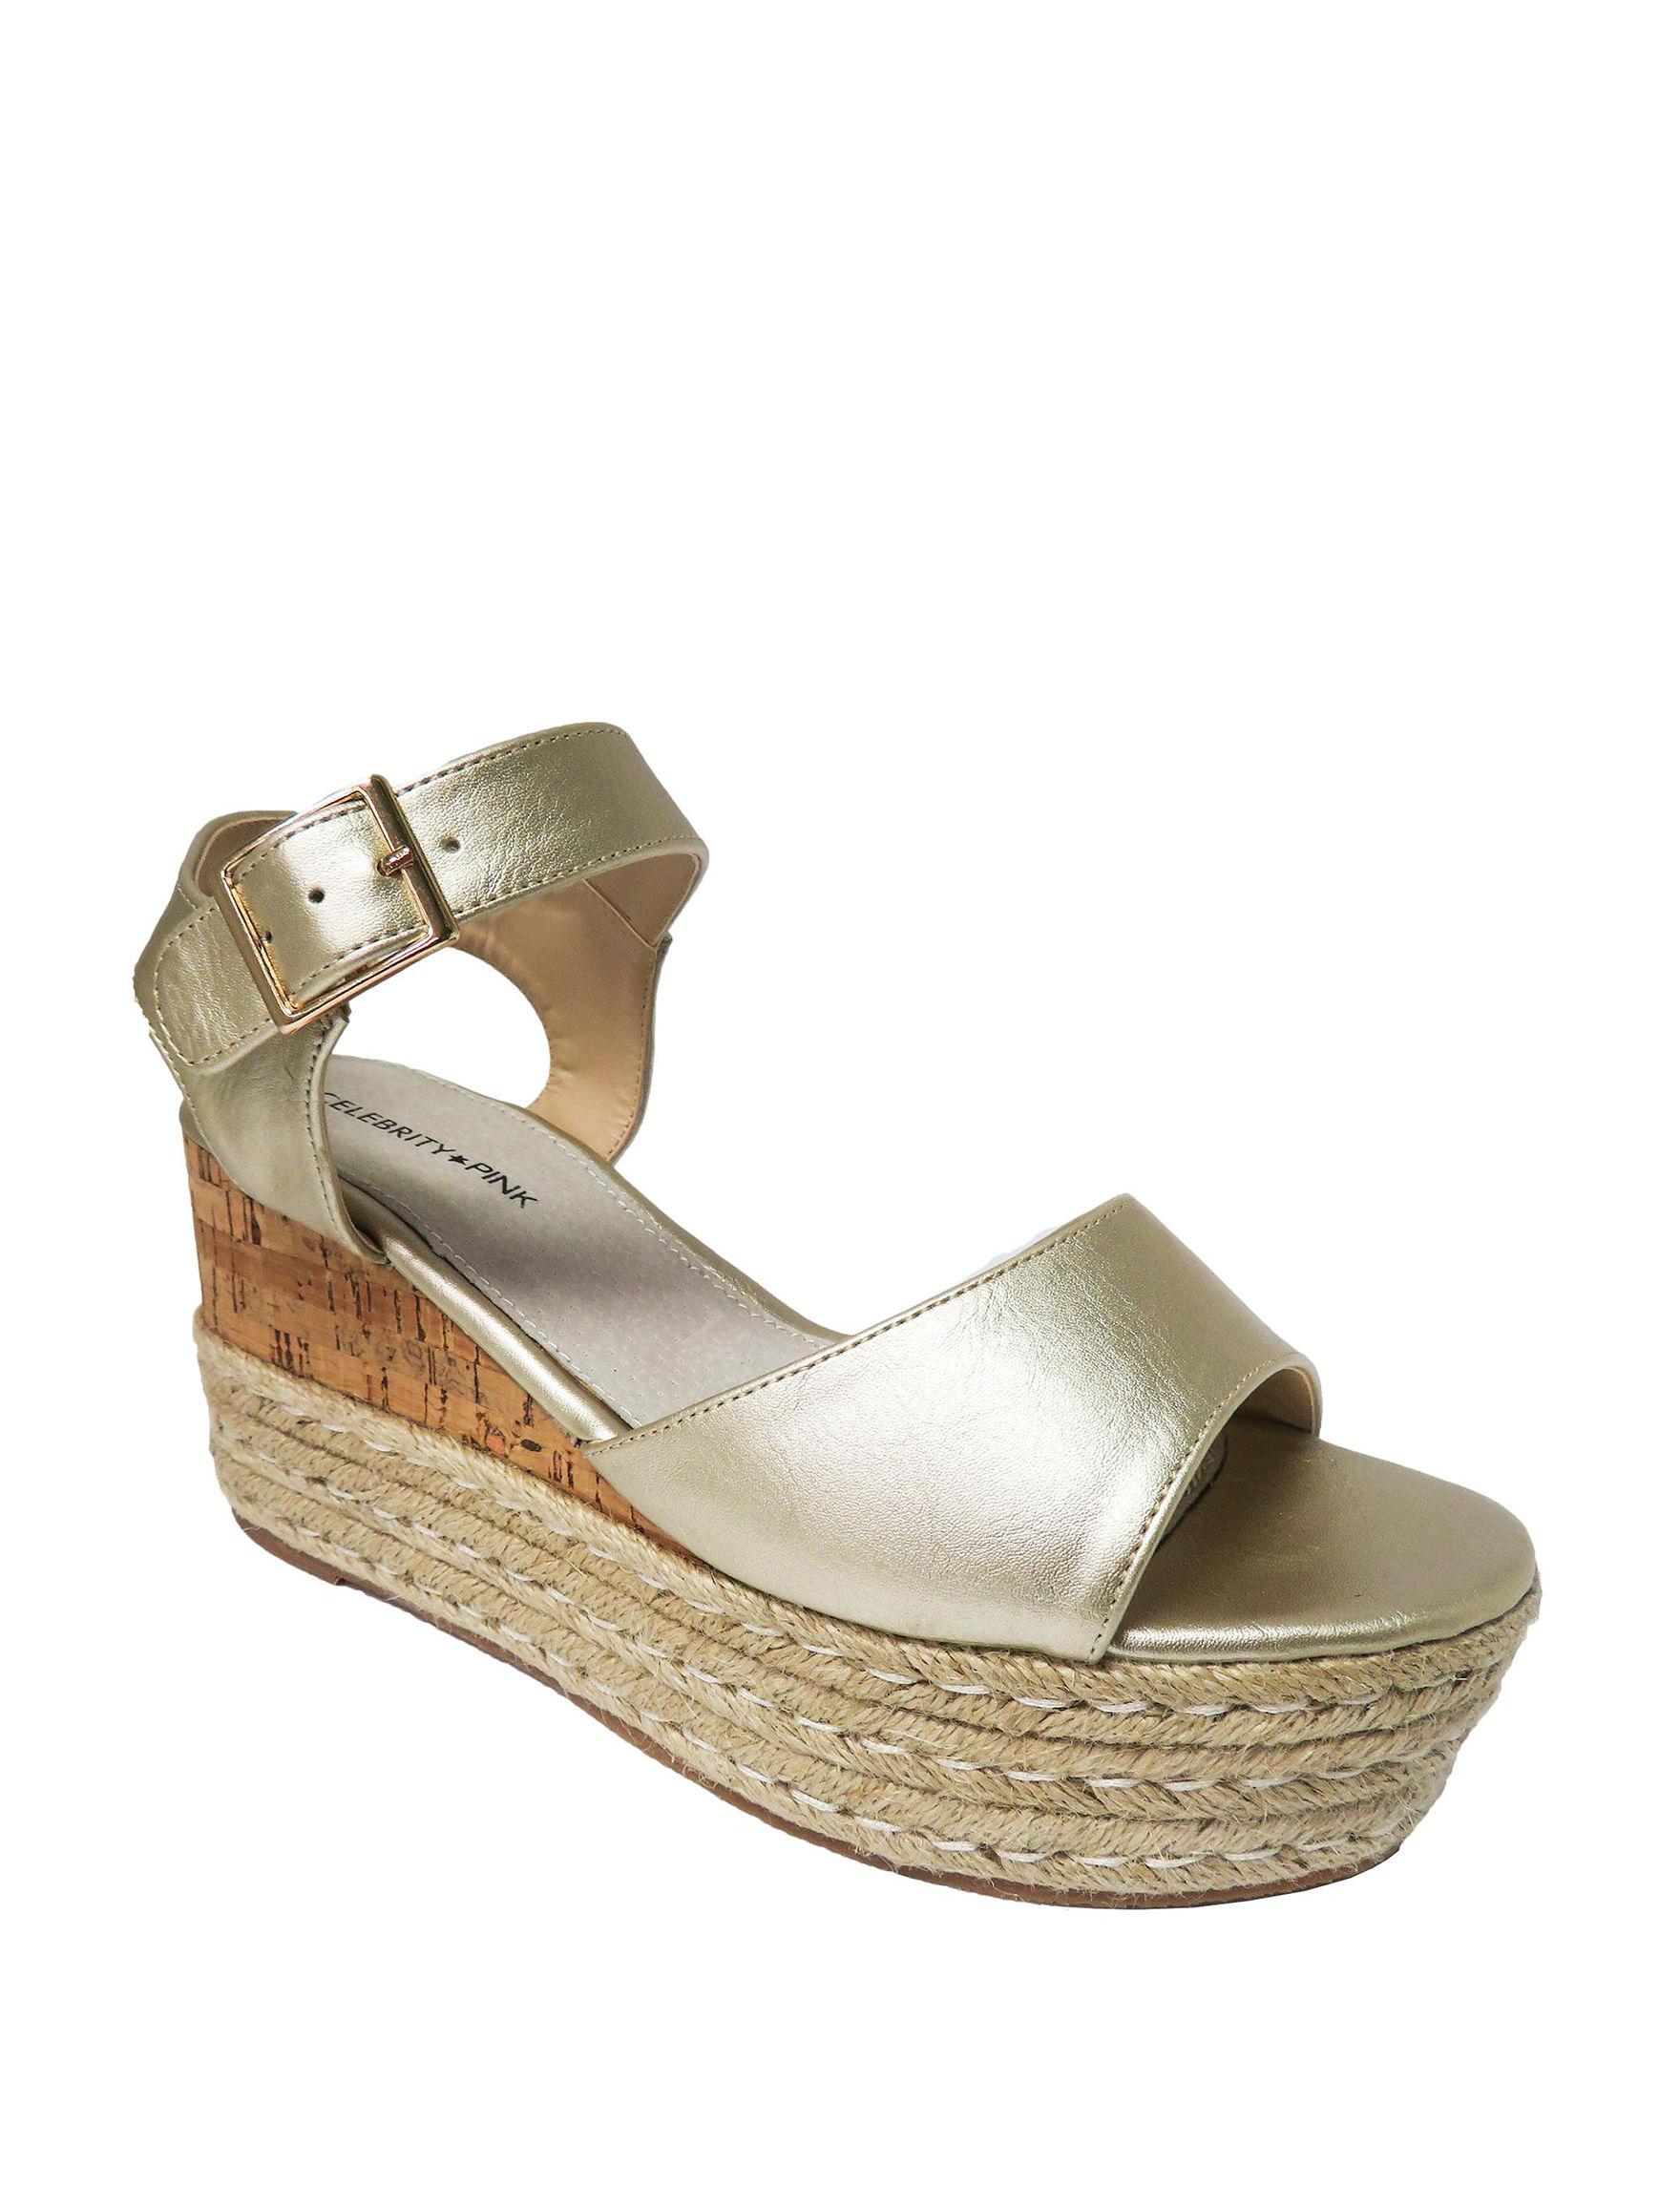 Celebrity Pink Gold Espadrille Wedge Sandals